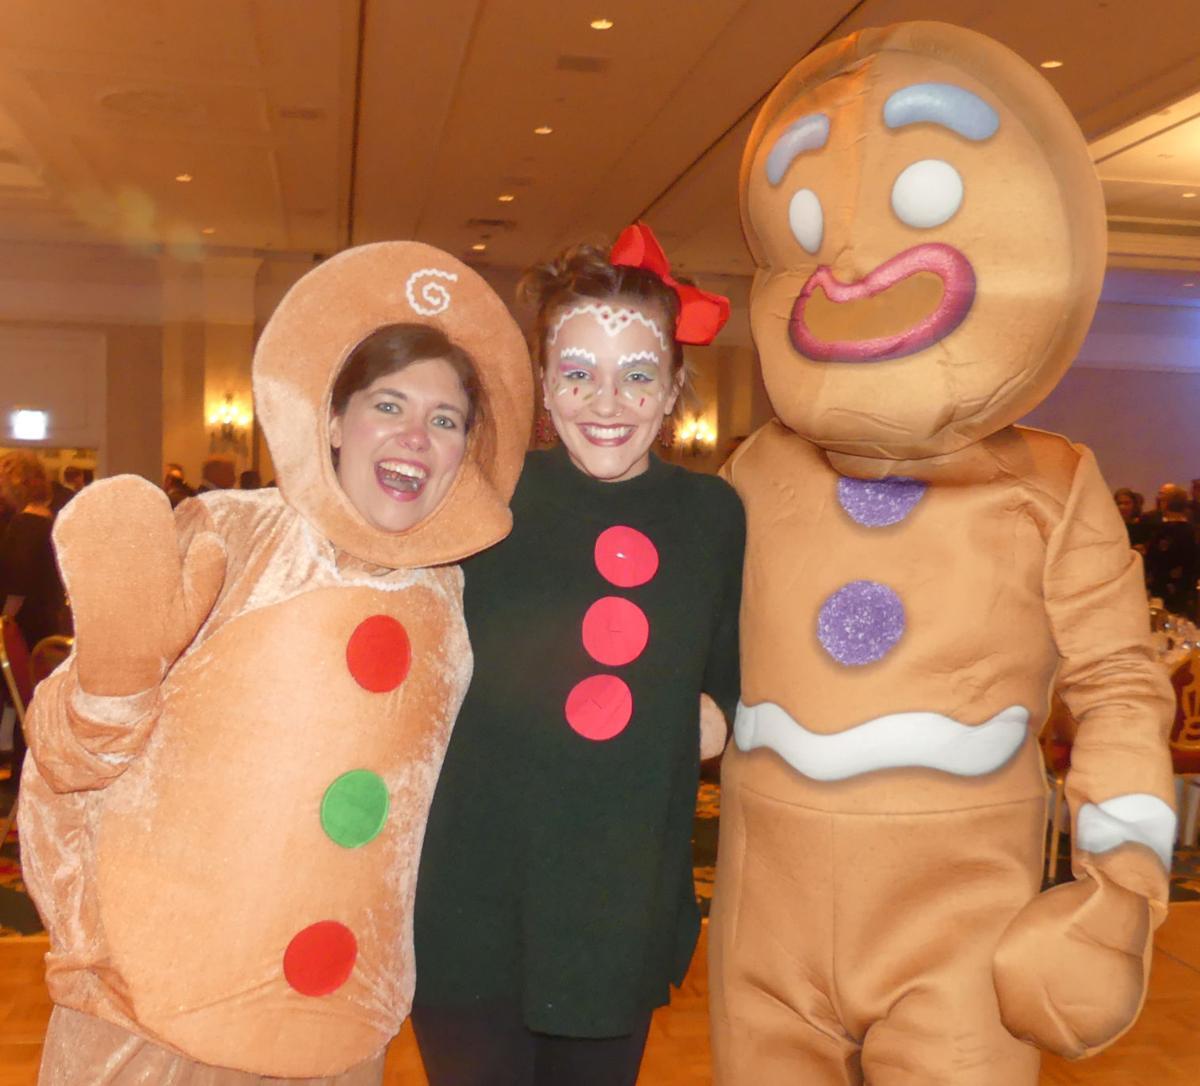 120119-life-at-gingerbread 1.jpg